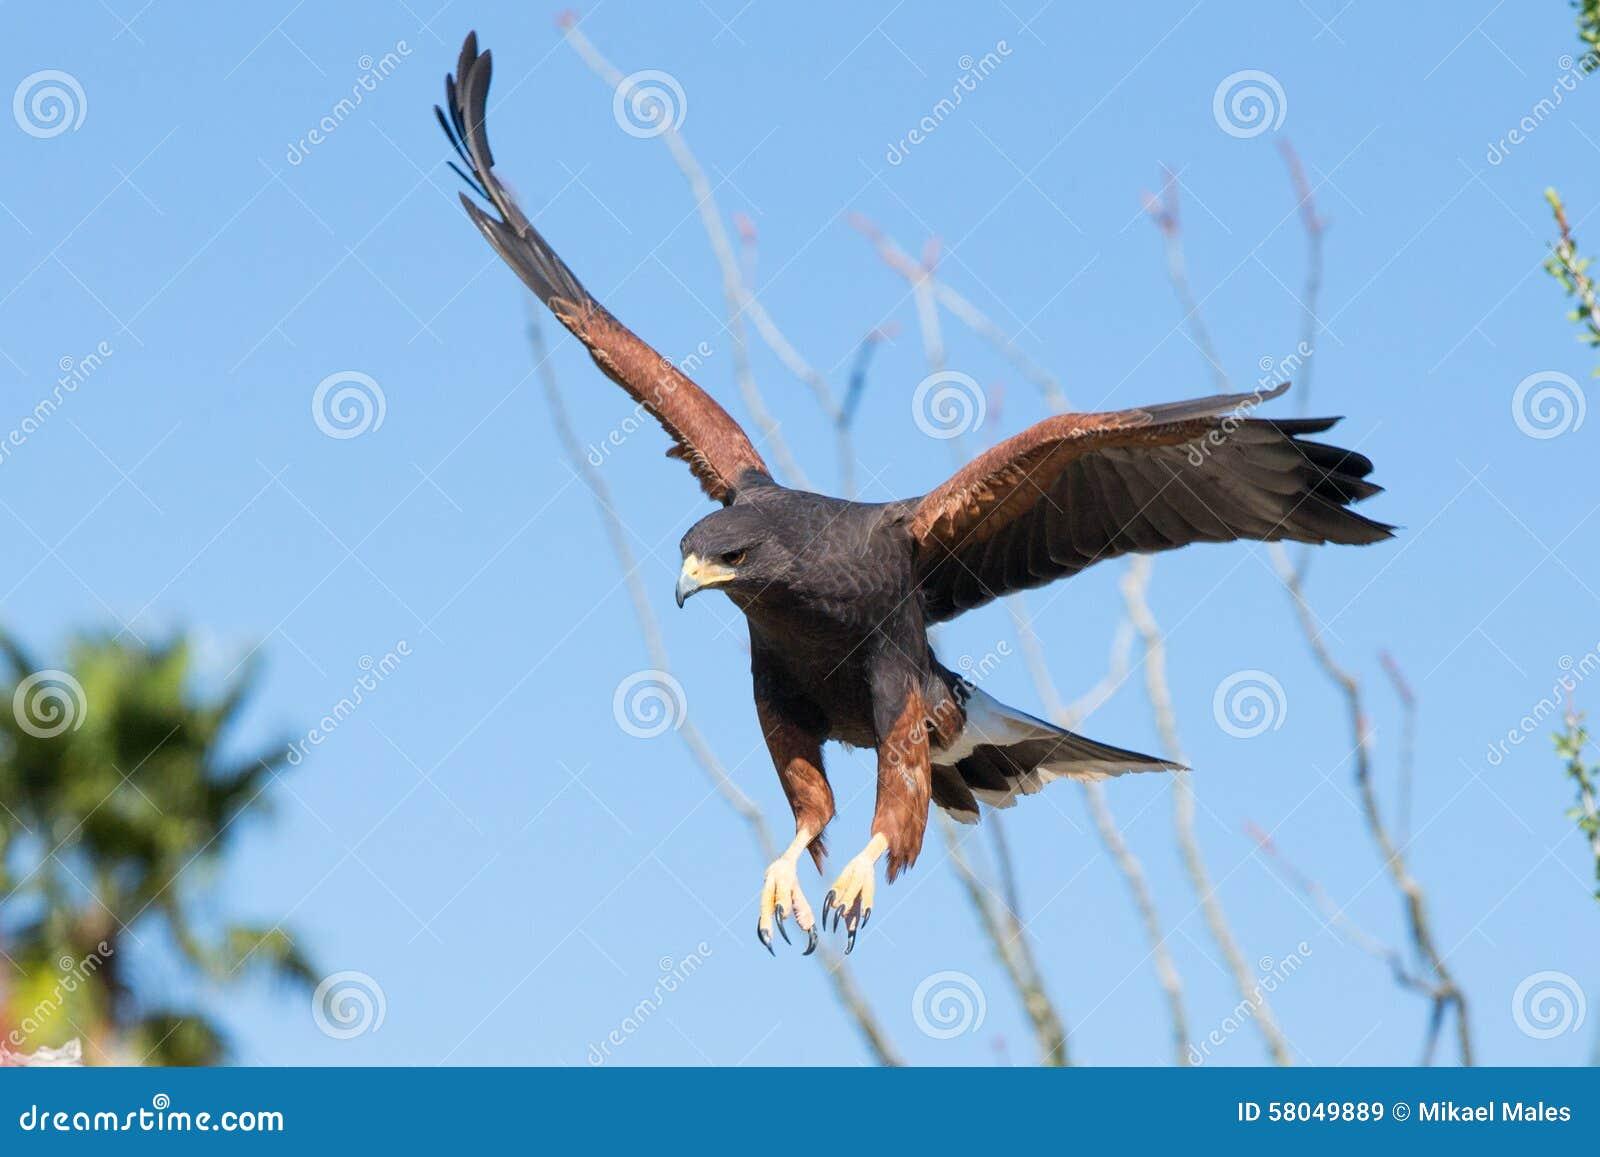 Harris Hawk descending on prey